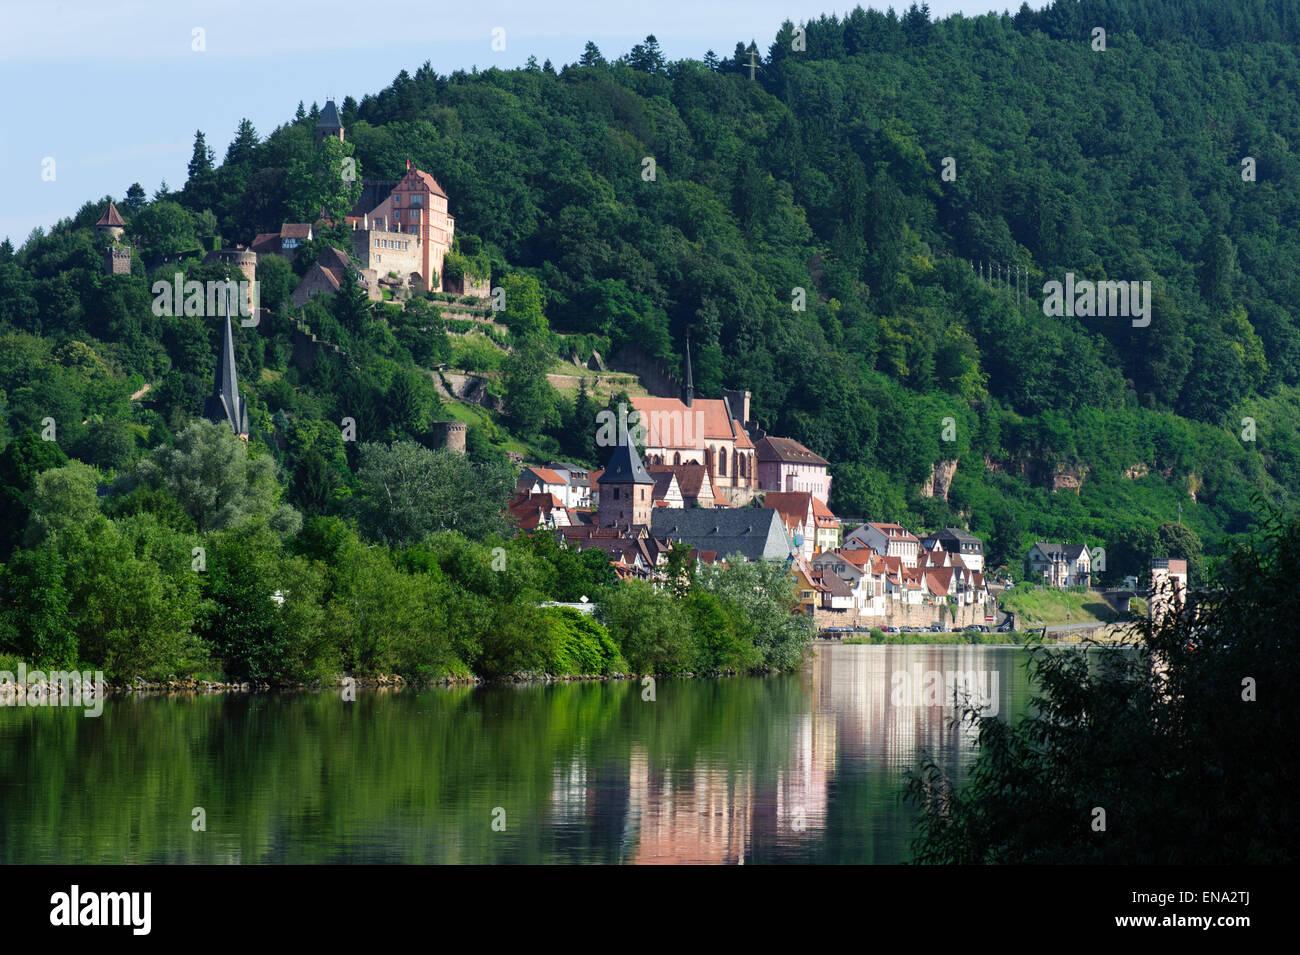 Altstadt Und Schloss, Hirschhorn, Neckar, Hessen, Deutschland | Altstadt und Burg, Hirschhorn, Neckar, Hessen, Deutschland Stockbild